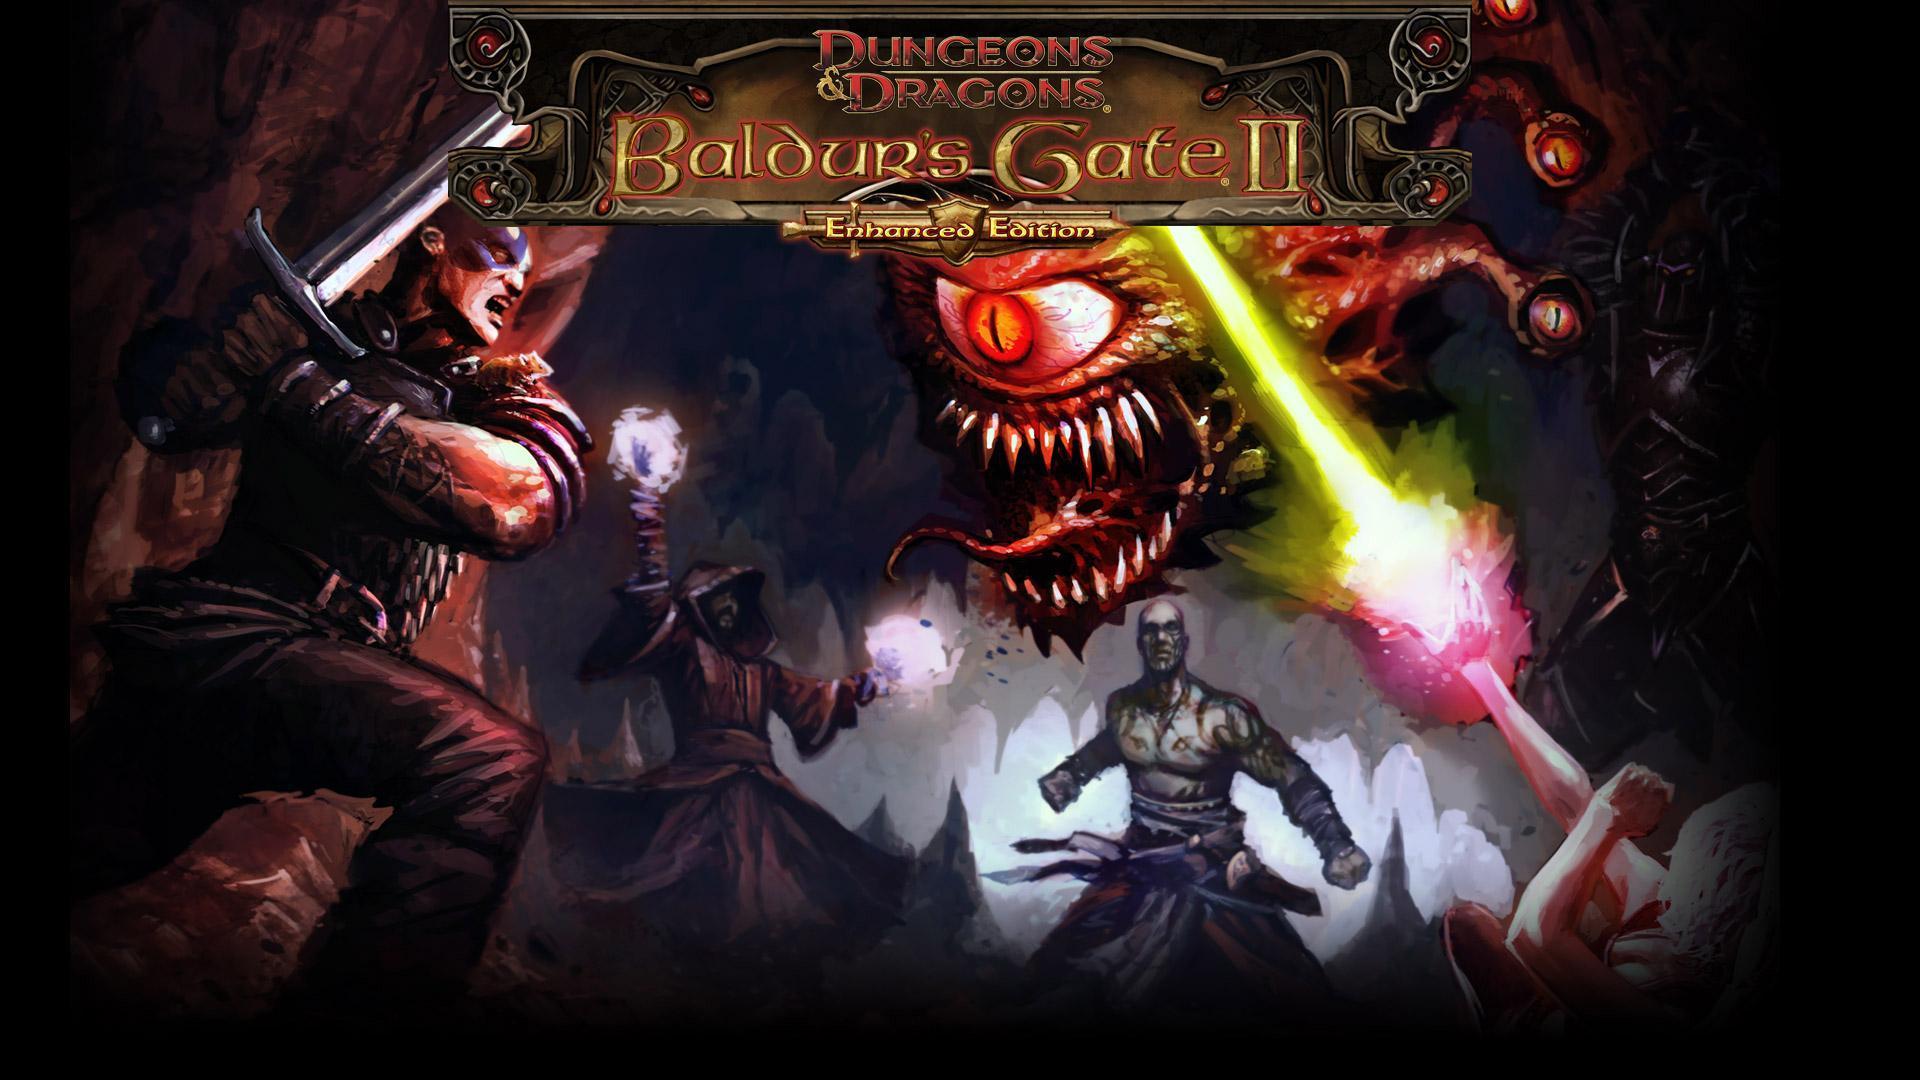 Baldurs Gate Ii Shadows Of Amn Wallpapers Top Free